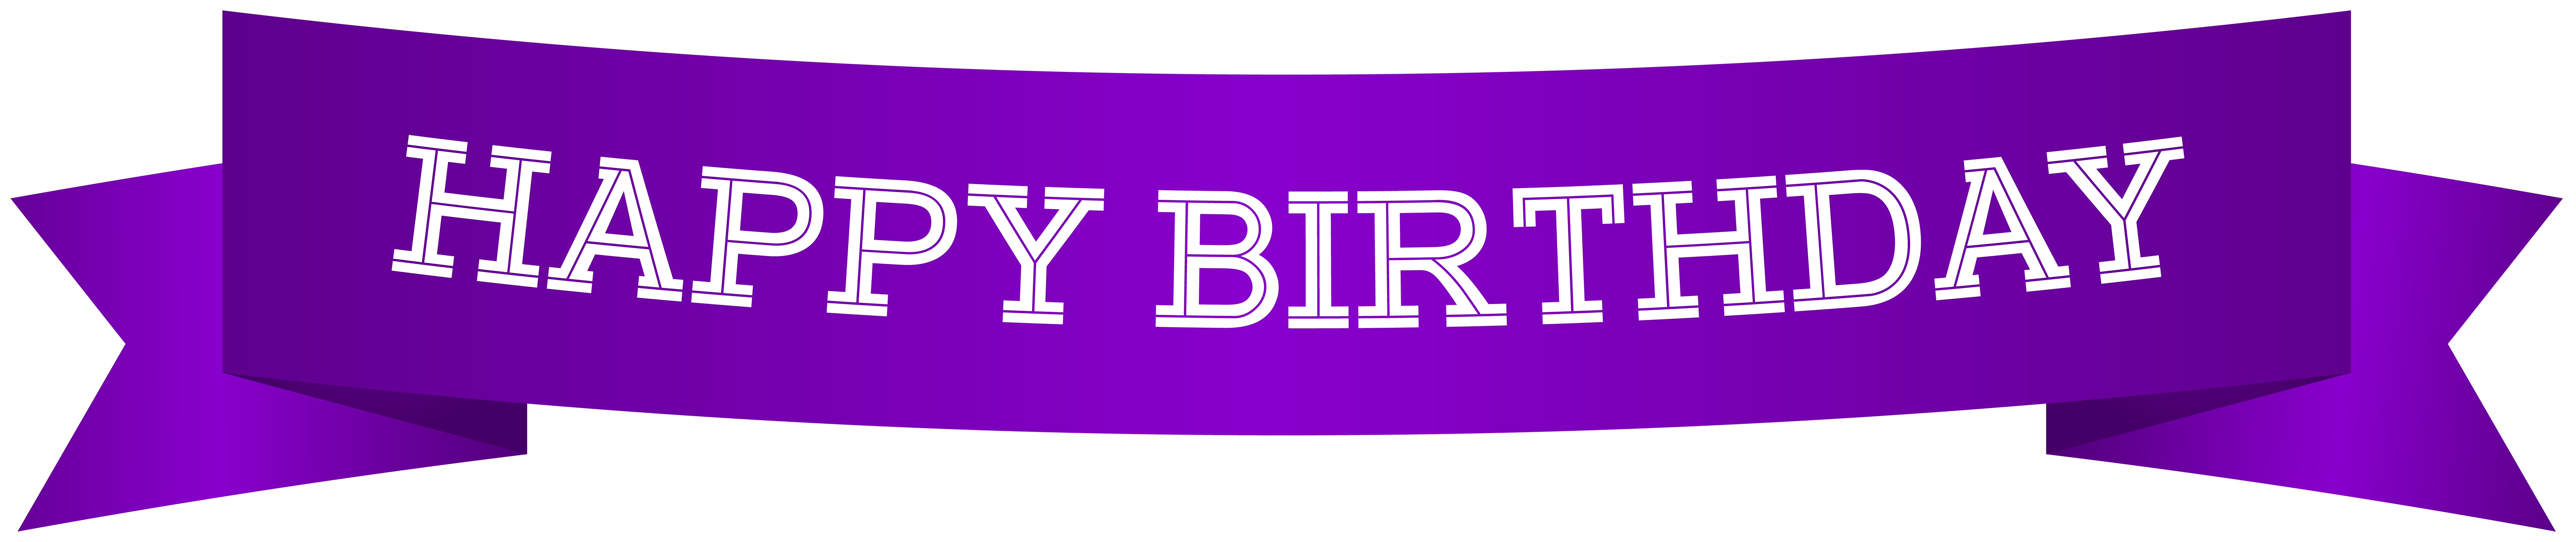 clip art Aura Bar and Lounge Birthday Banner Clip art